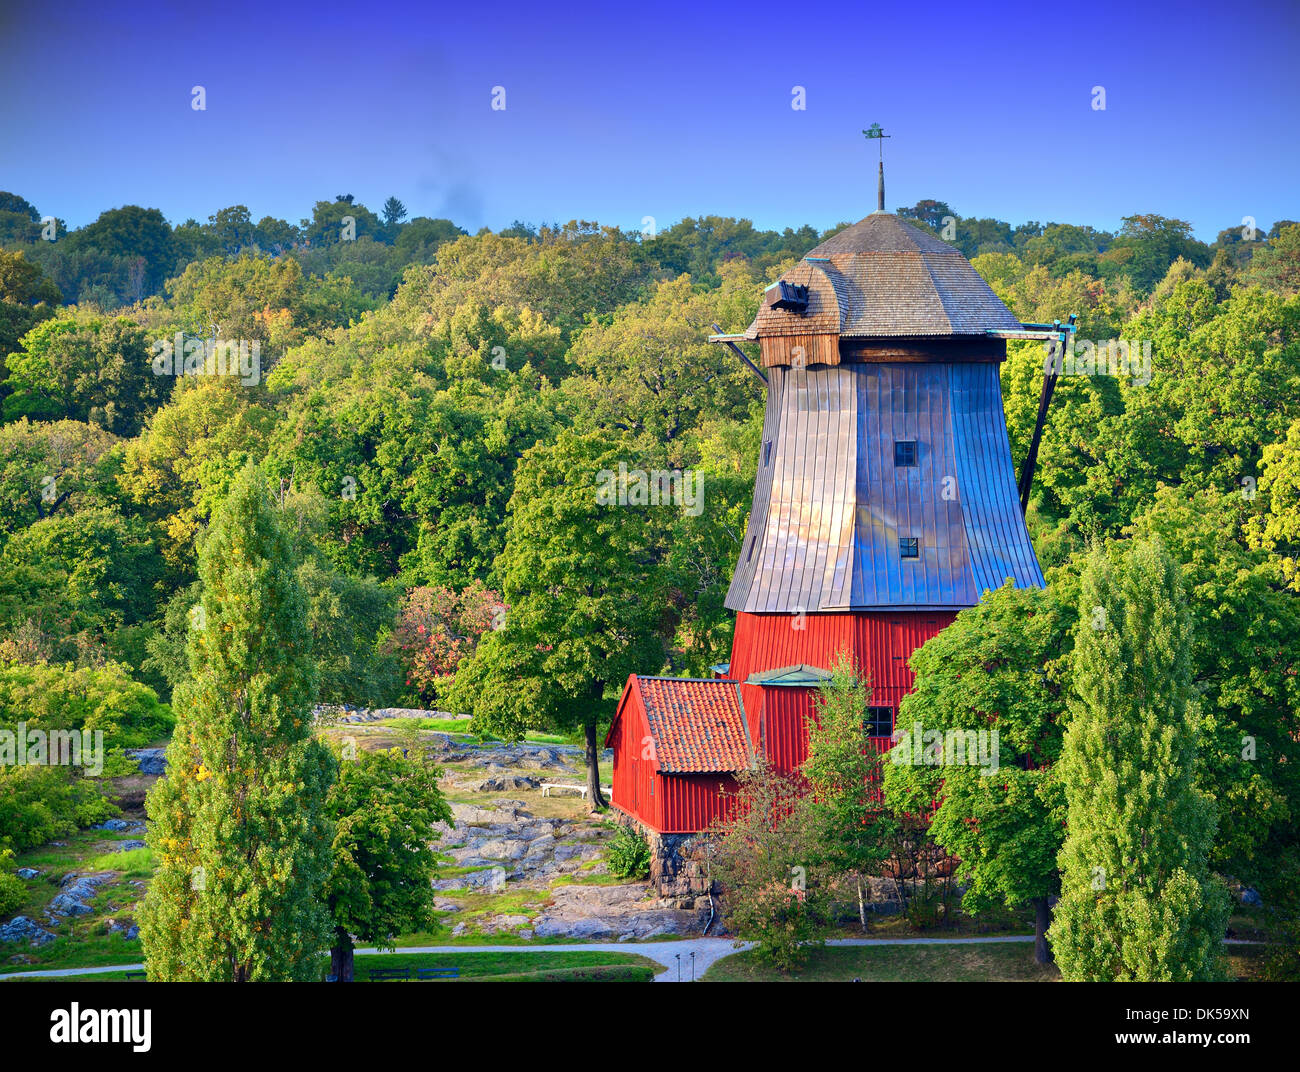 Antigua casa de granja en Helsinki, Finlandia. Imagen De Stock